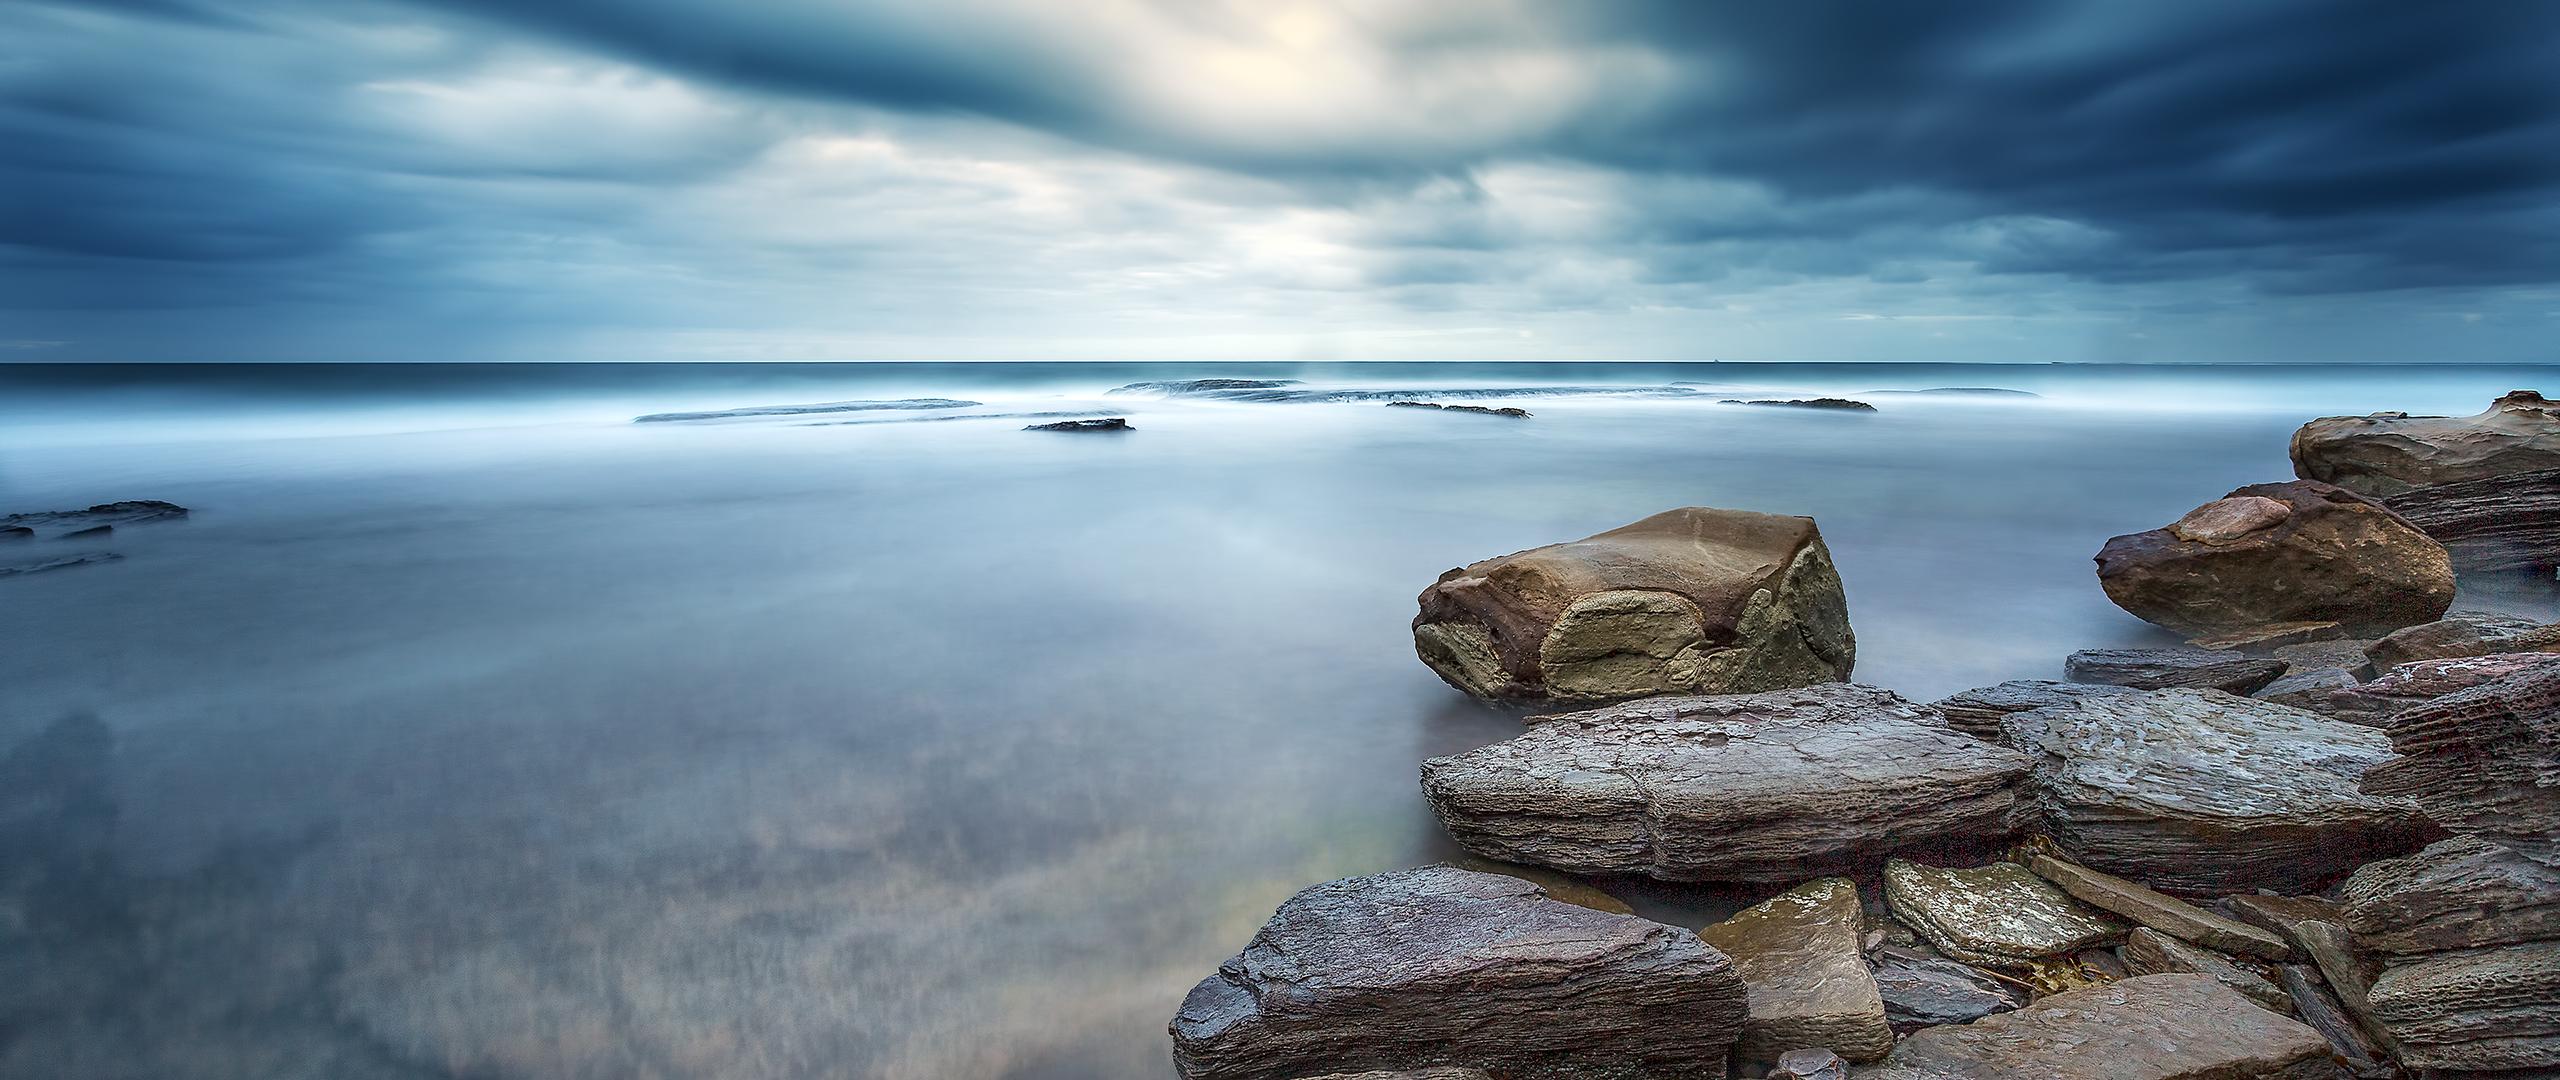 горизонт камни вода  № 2556044 бесплатно